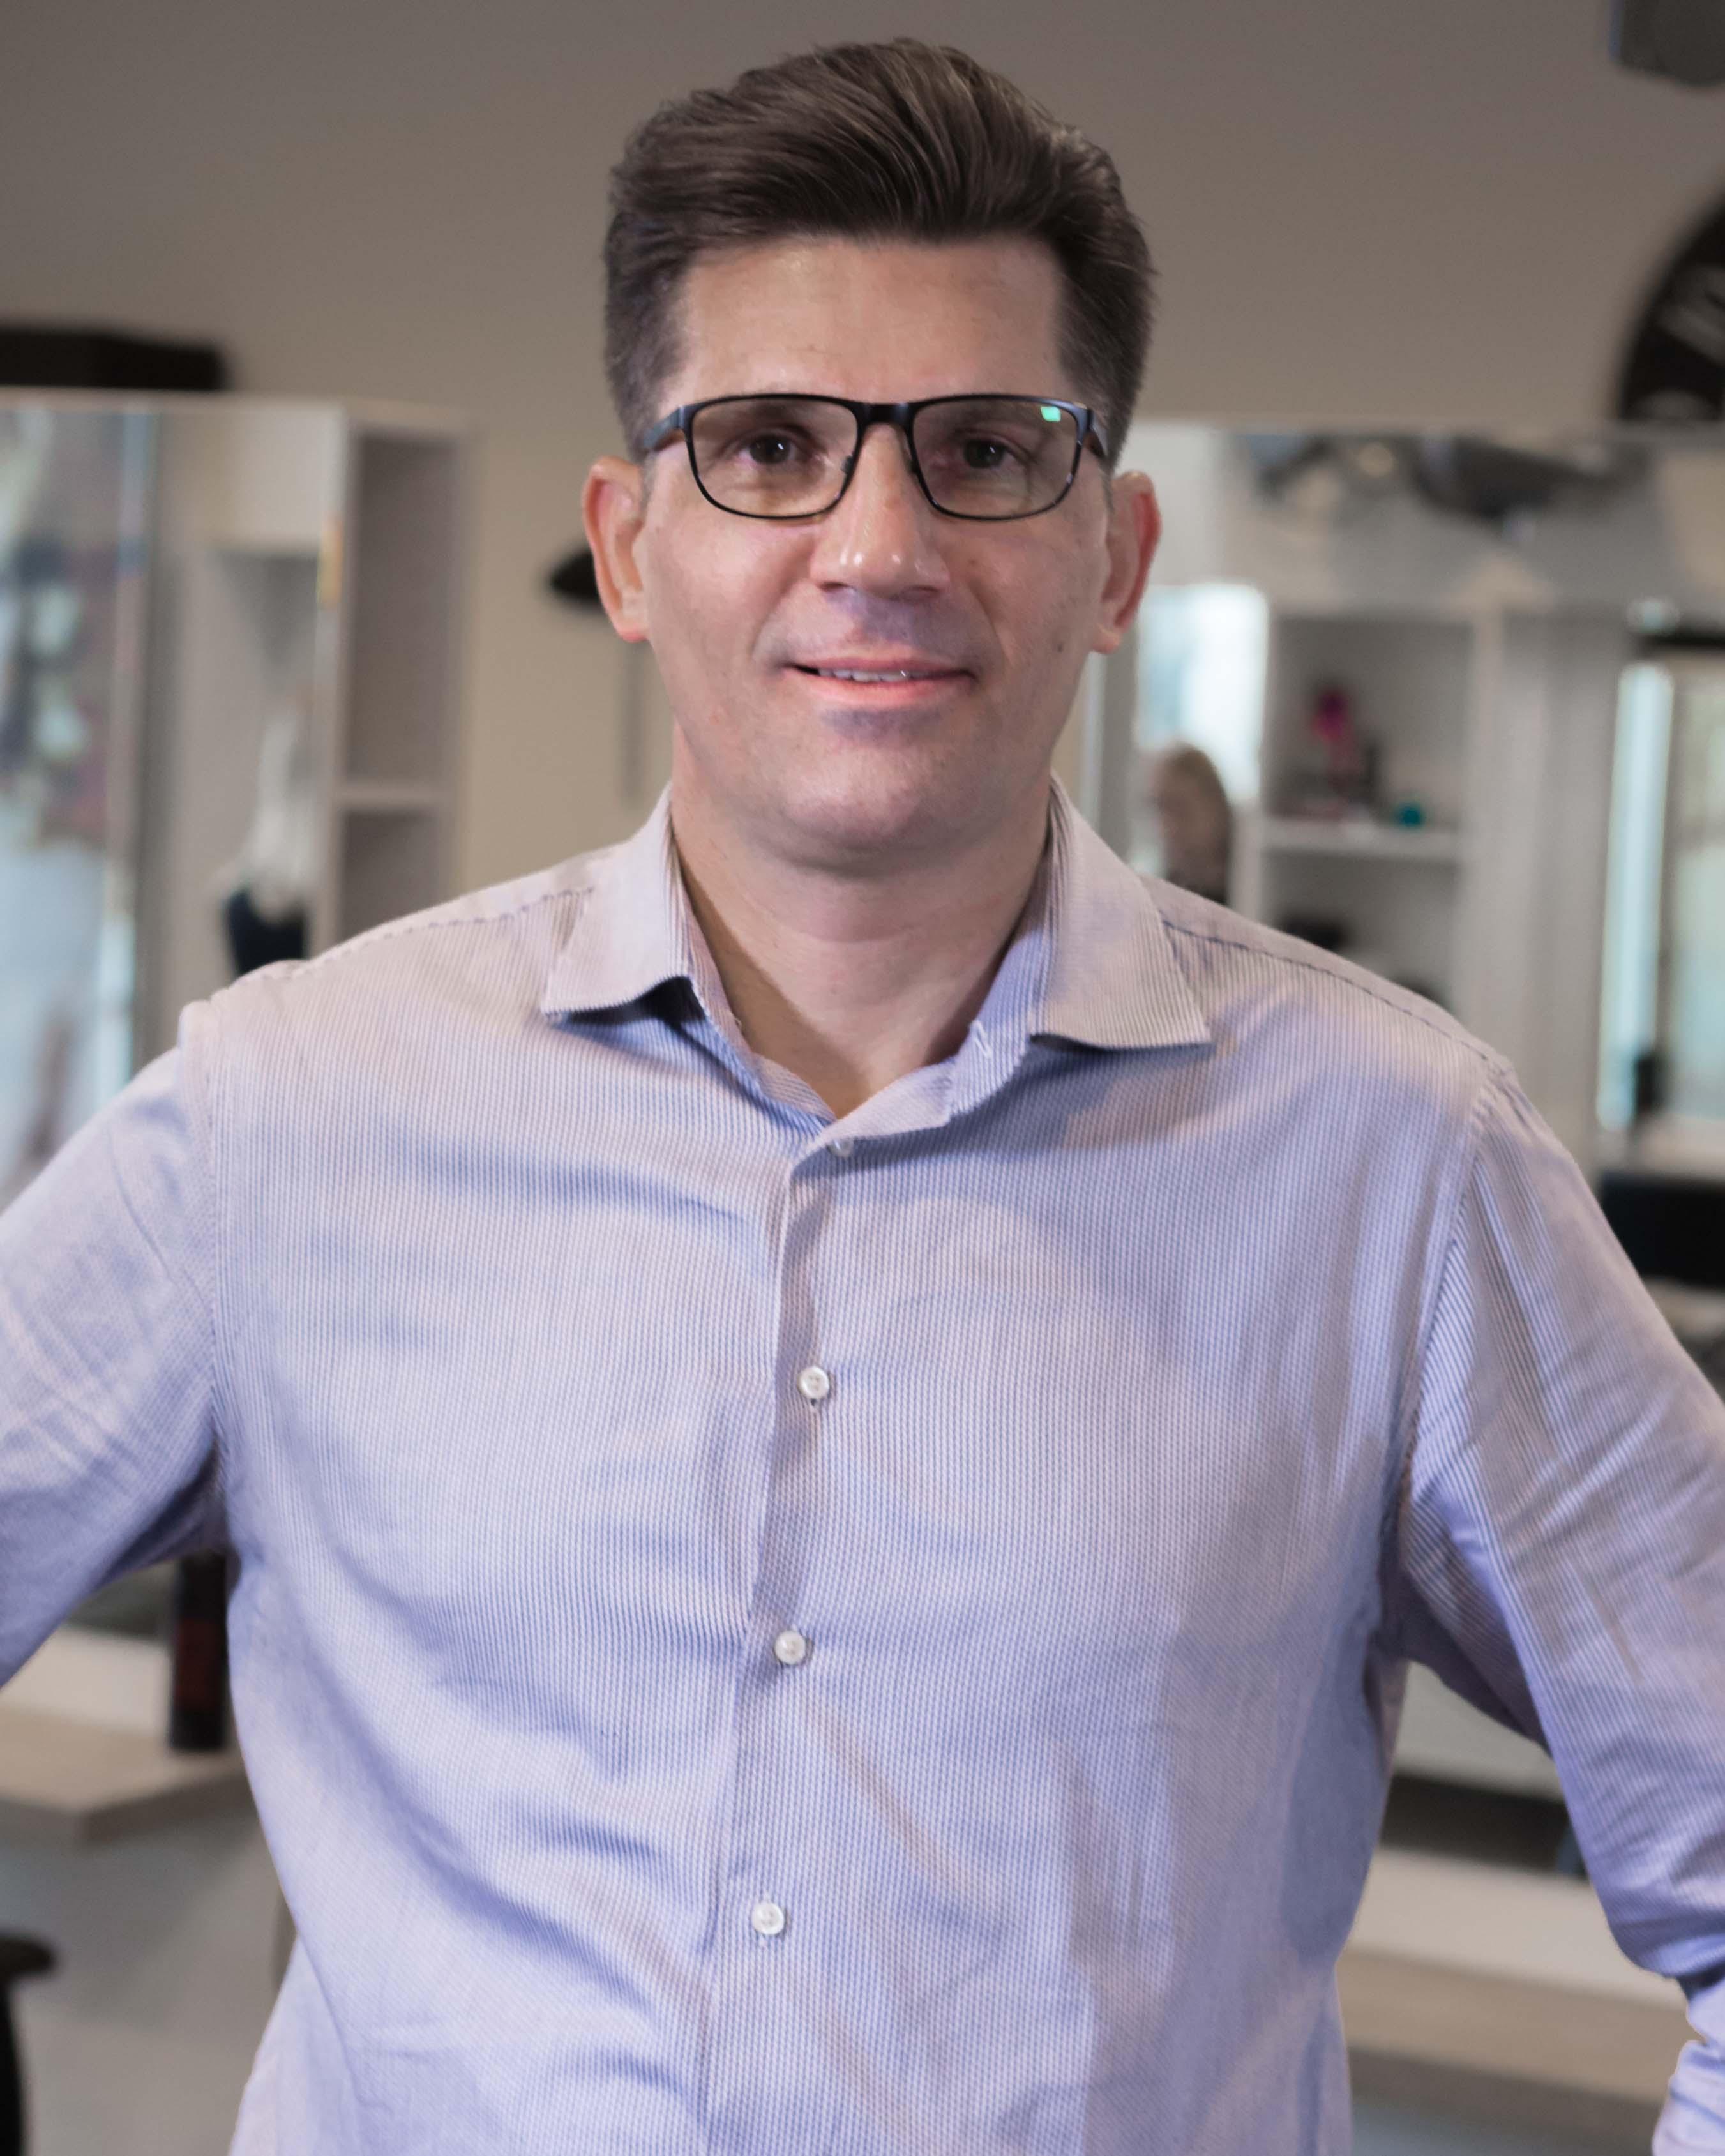 Léon - Kapper bij Hairstyling Hélène Stellendam